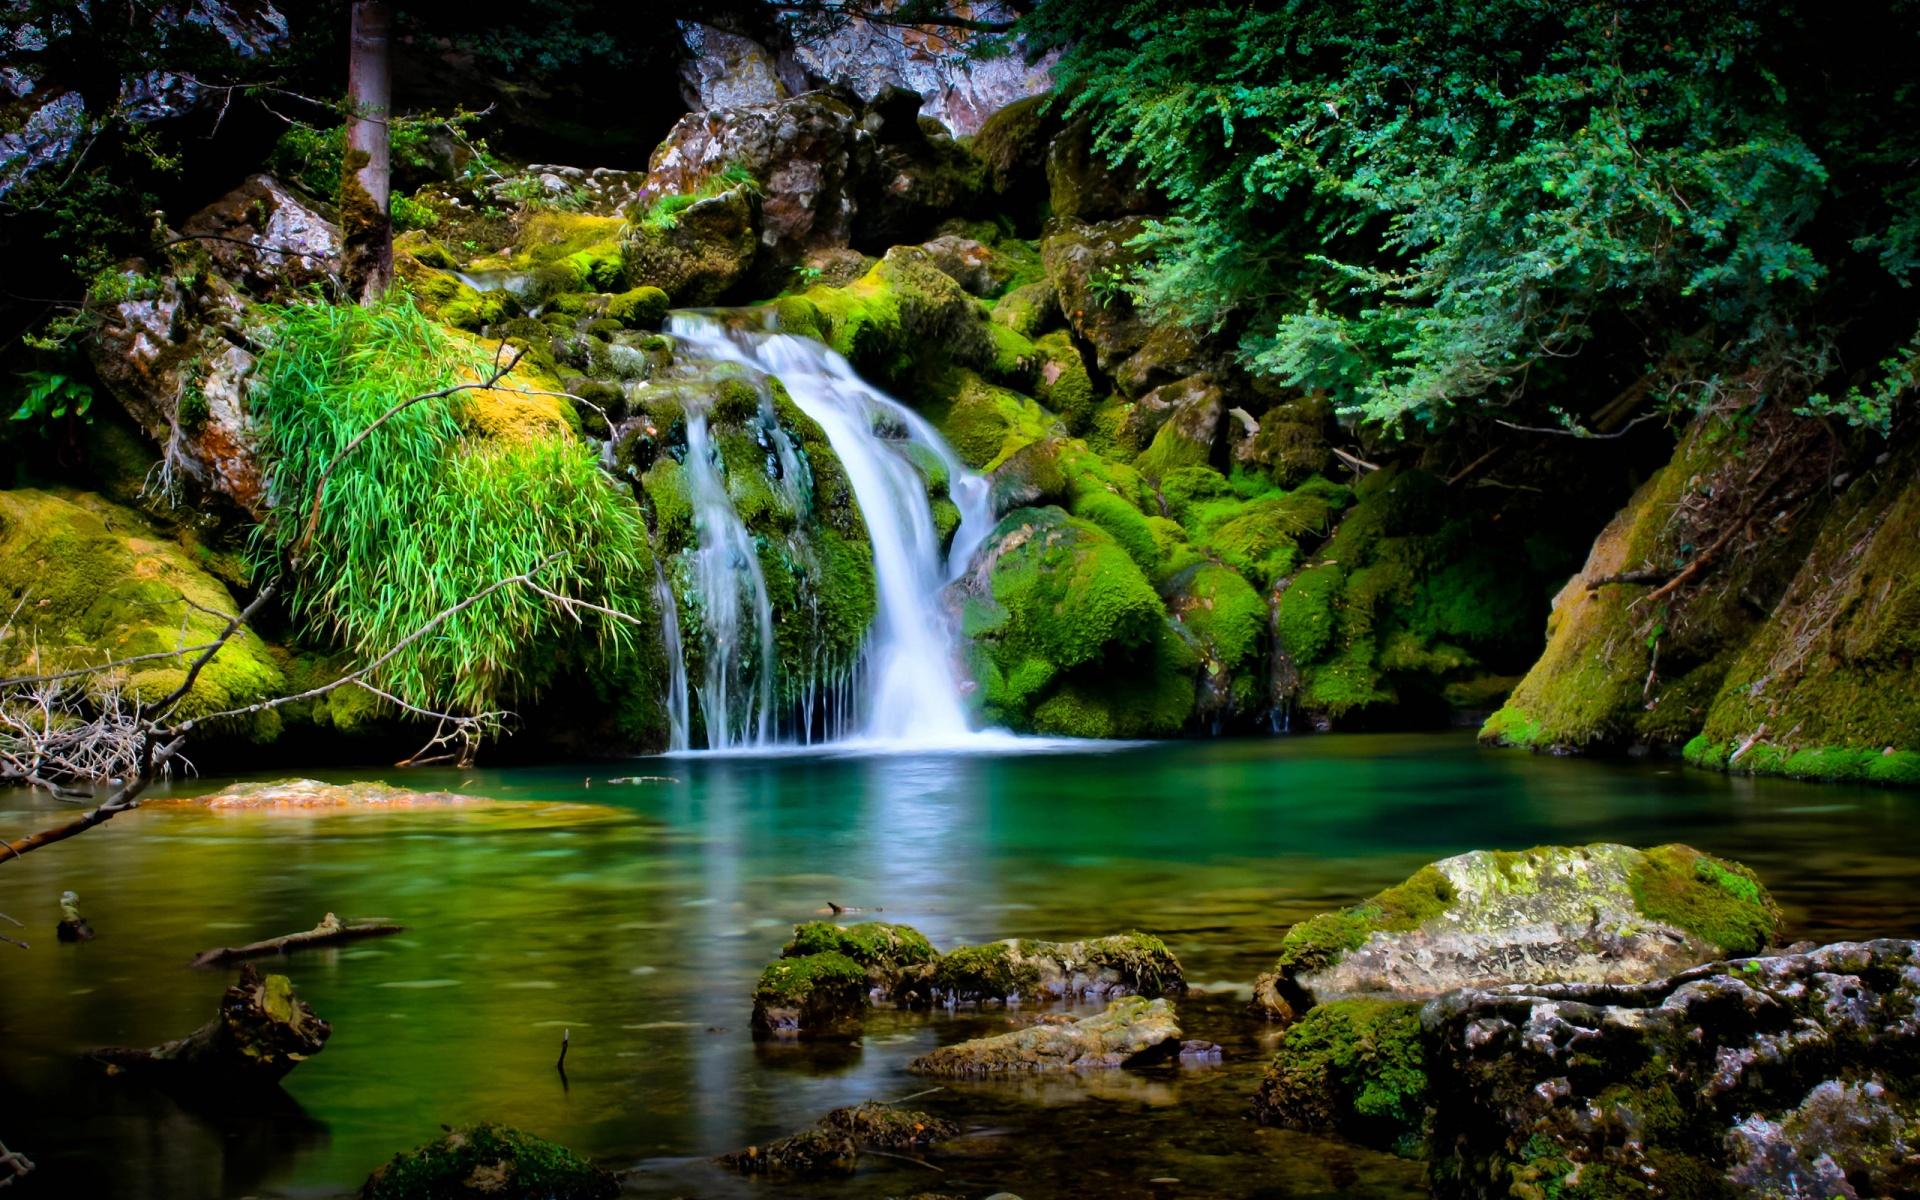 Waterfall Wallpaper Desktop   1370800 1920x1200